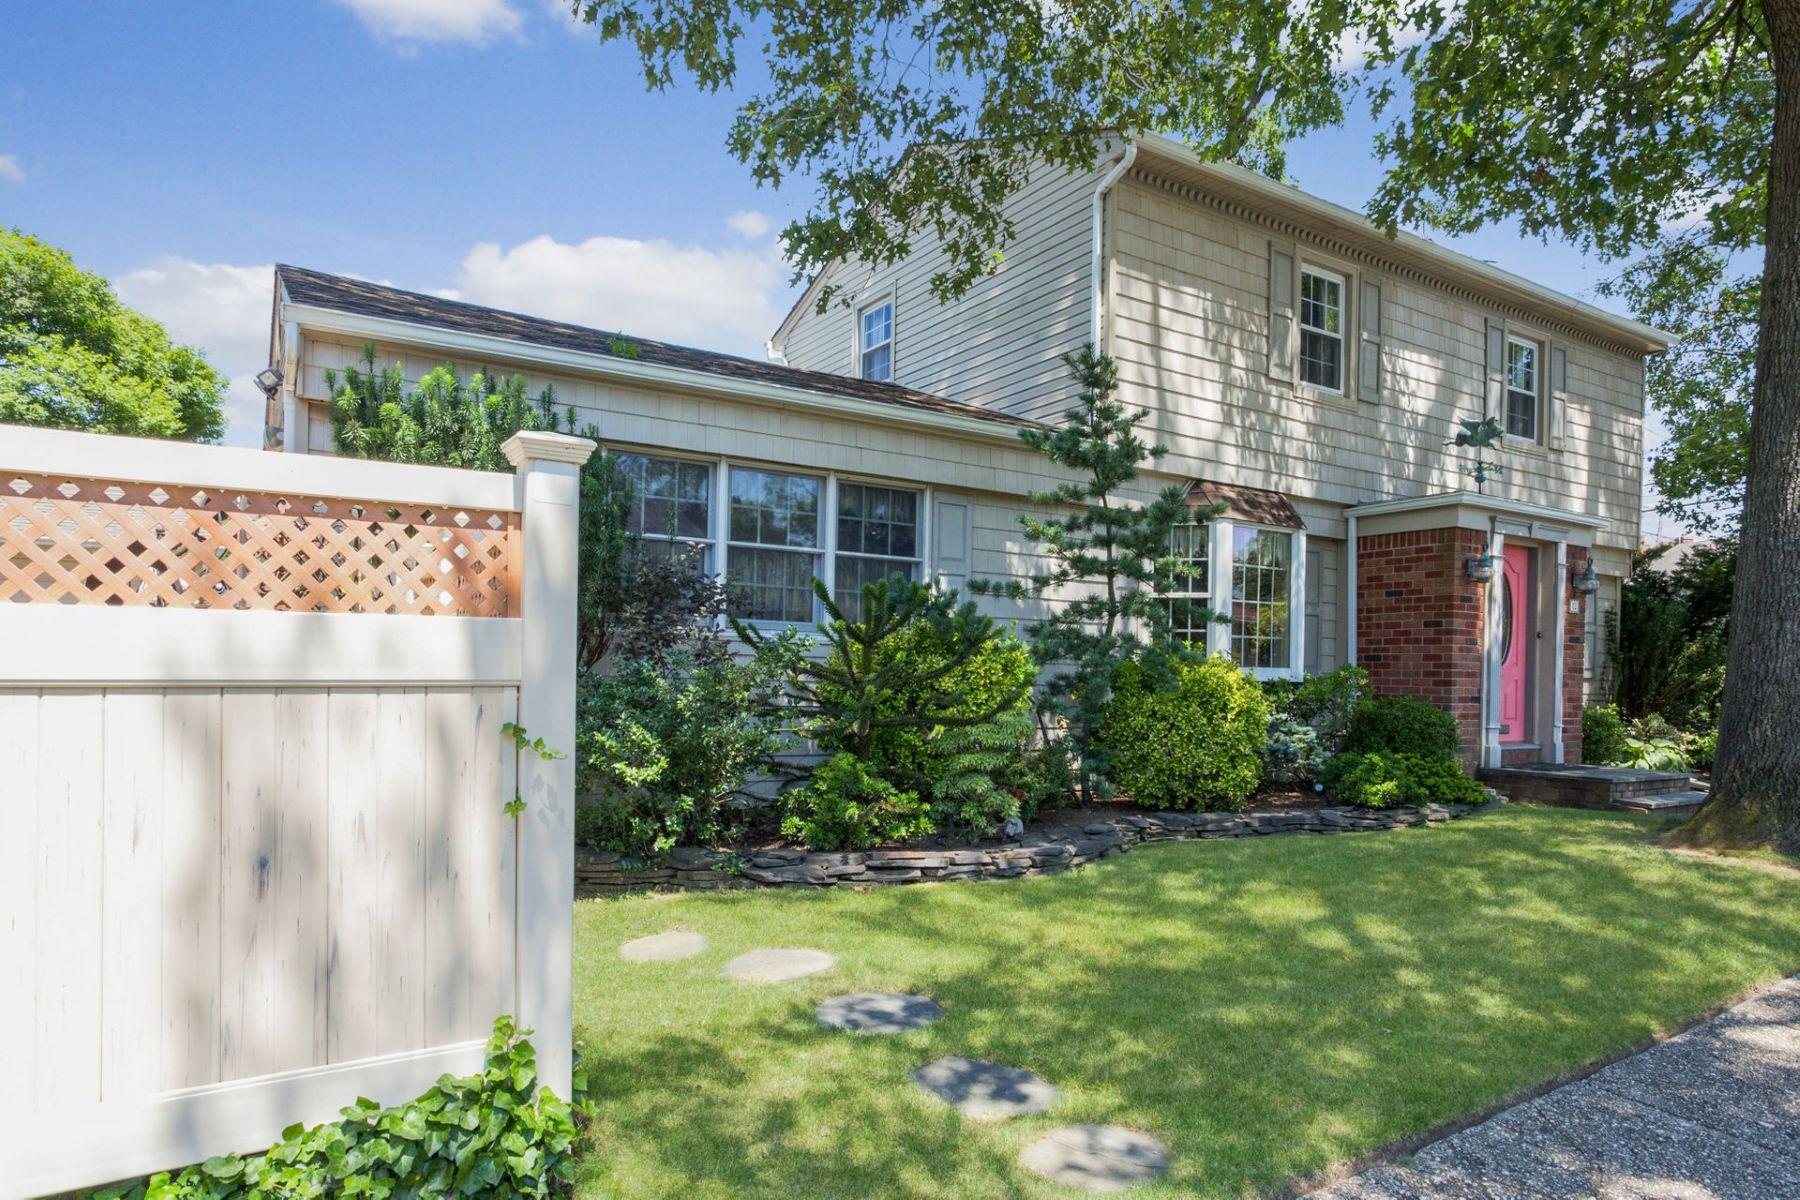 Single Family Homes for Sale at Malverne 12 Home Street Malverne, New York 11565 United States